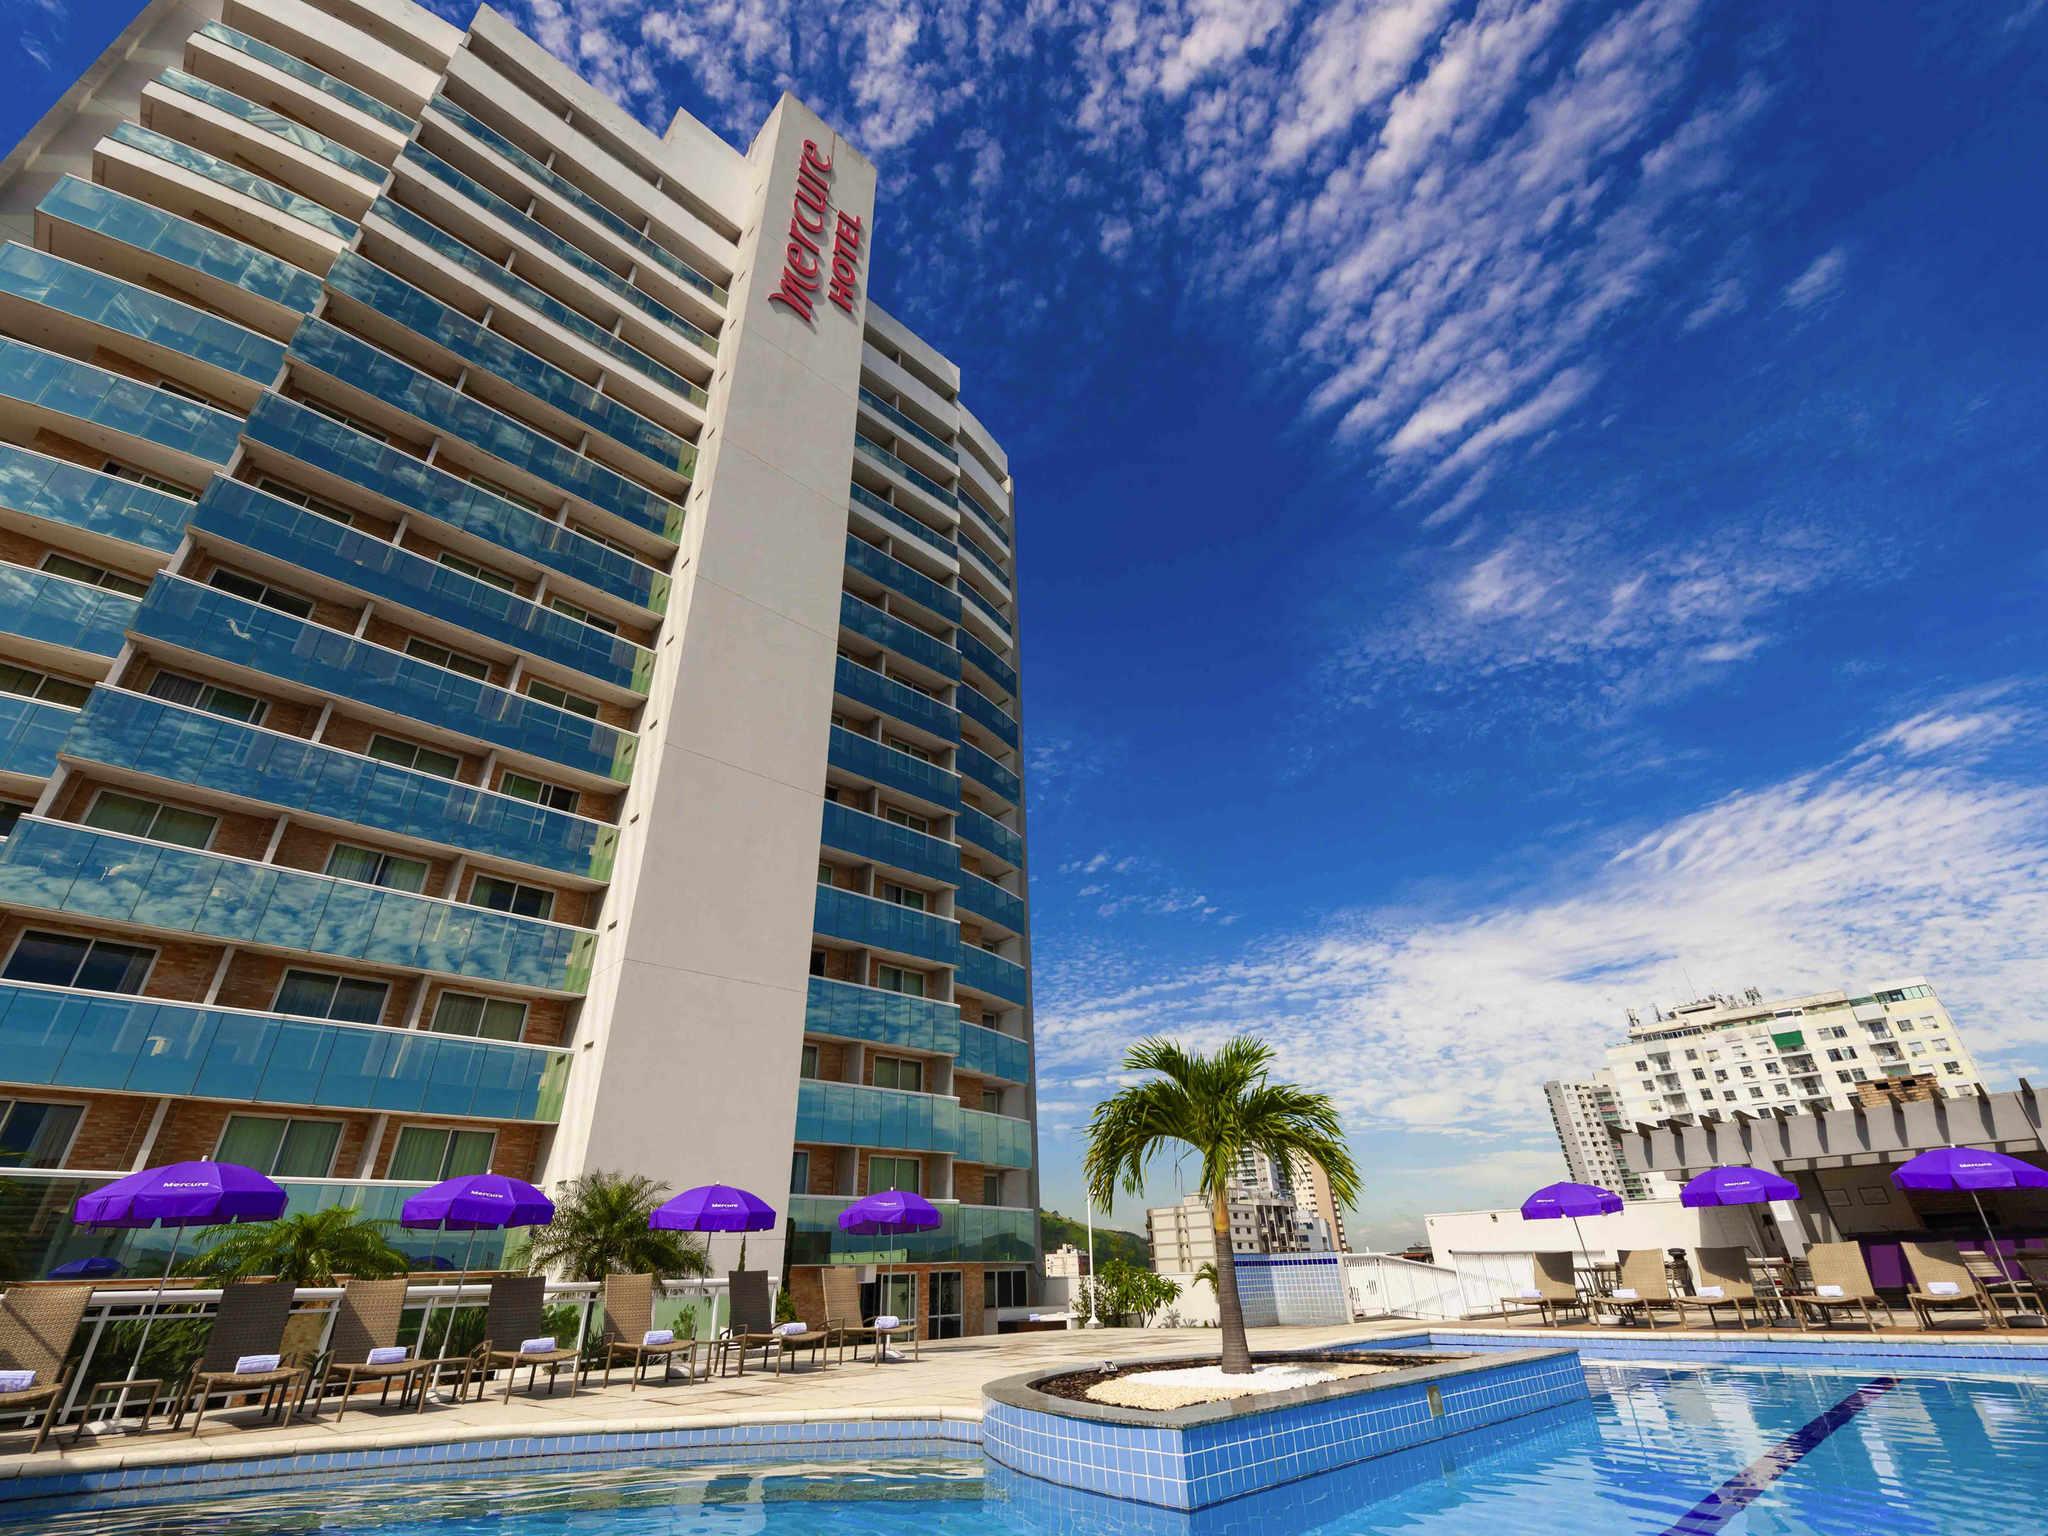 Hotel - Mercure Rio de Janeiro Nova Iguacu Hotel